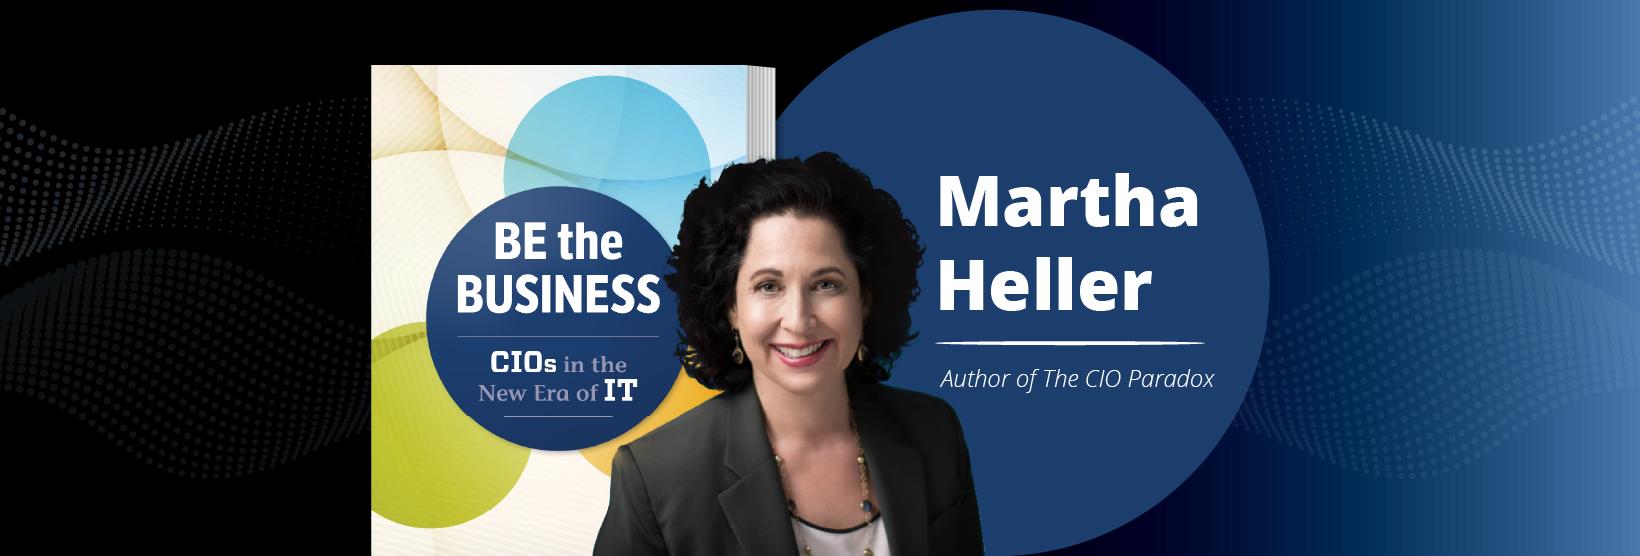 Solving IT Talent Crisis Requires Self-Service Tools & Culture Change